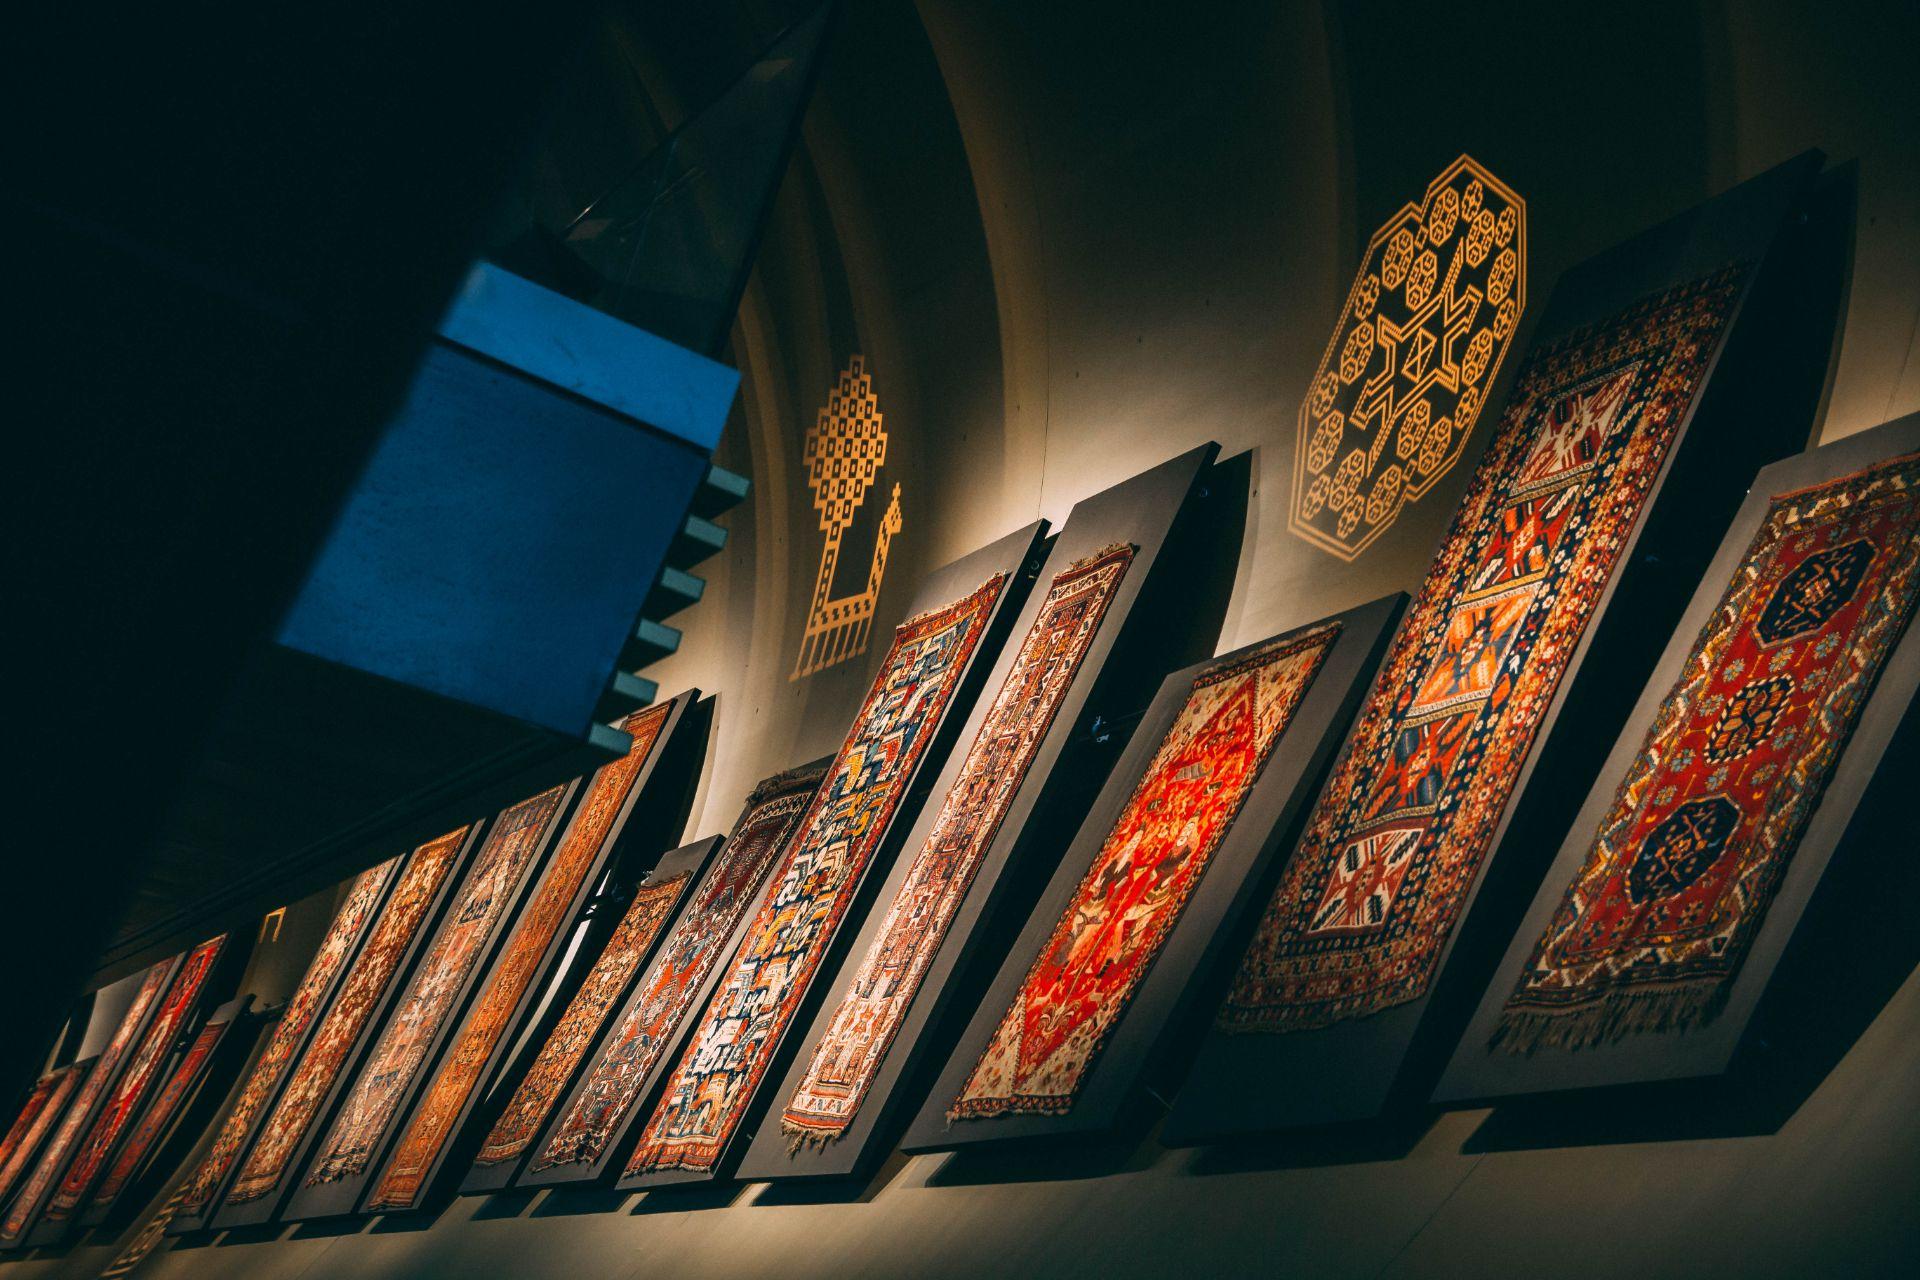 carpet_museum_baku-azerbaijan